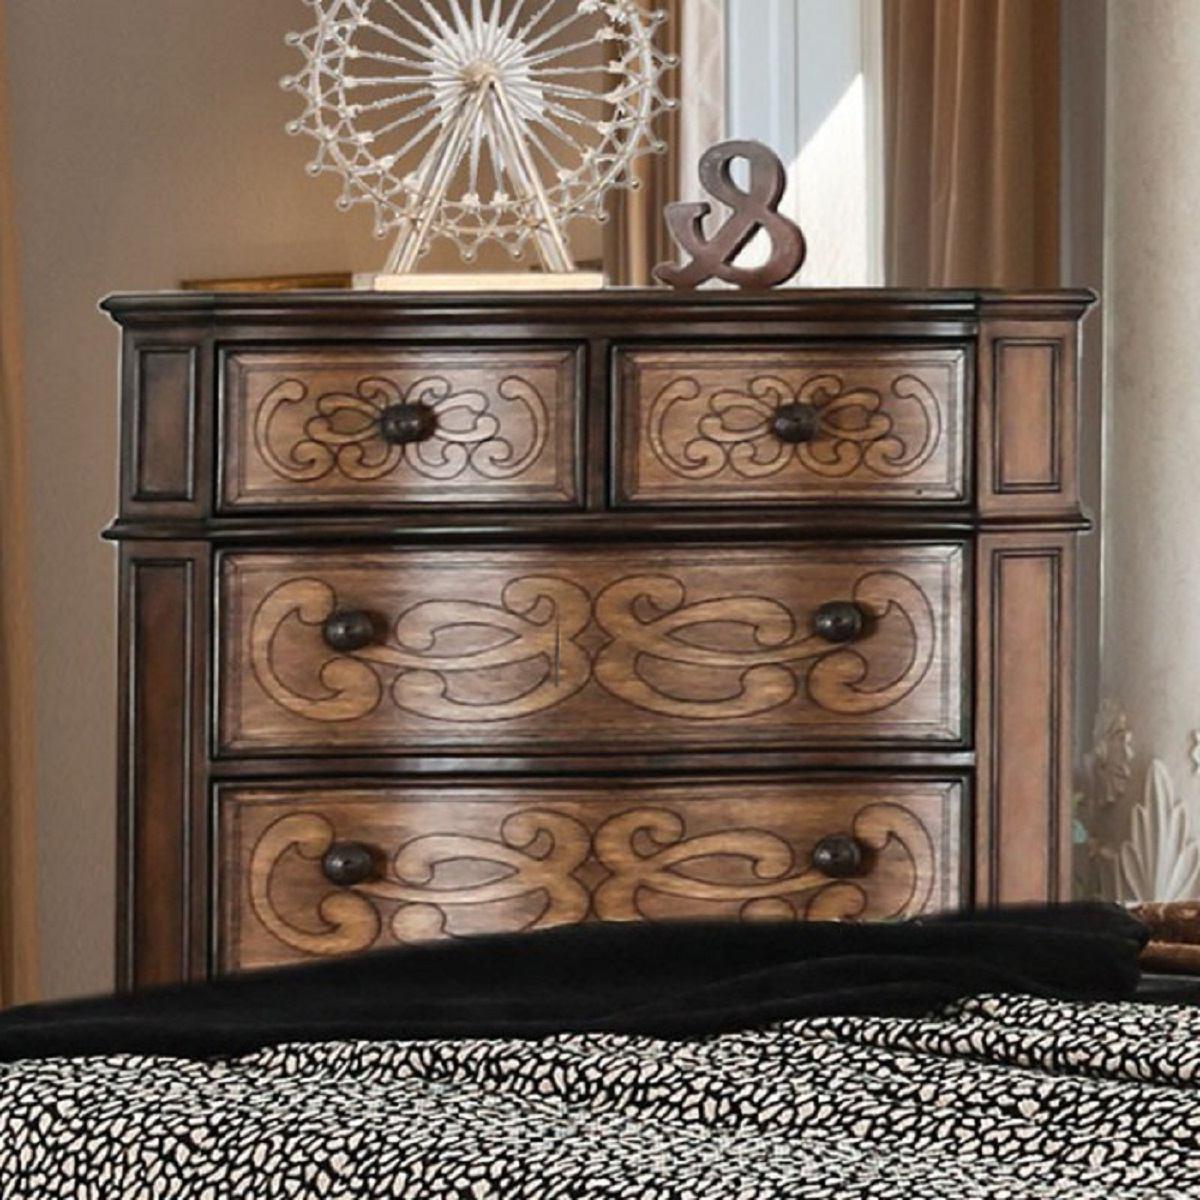 Popular Furniture Of America Emmaline 6 Drawer Chest In Warm Chestnut Cm7831C For Emmaline Sideboards (Gallery 17 of 20)